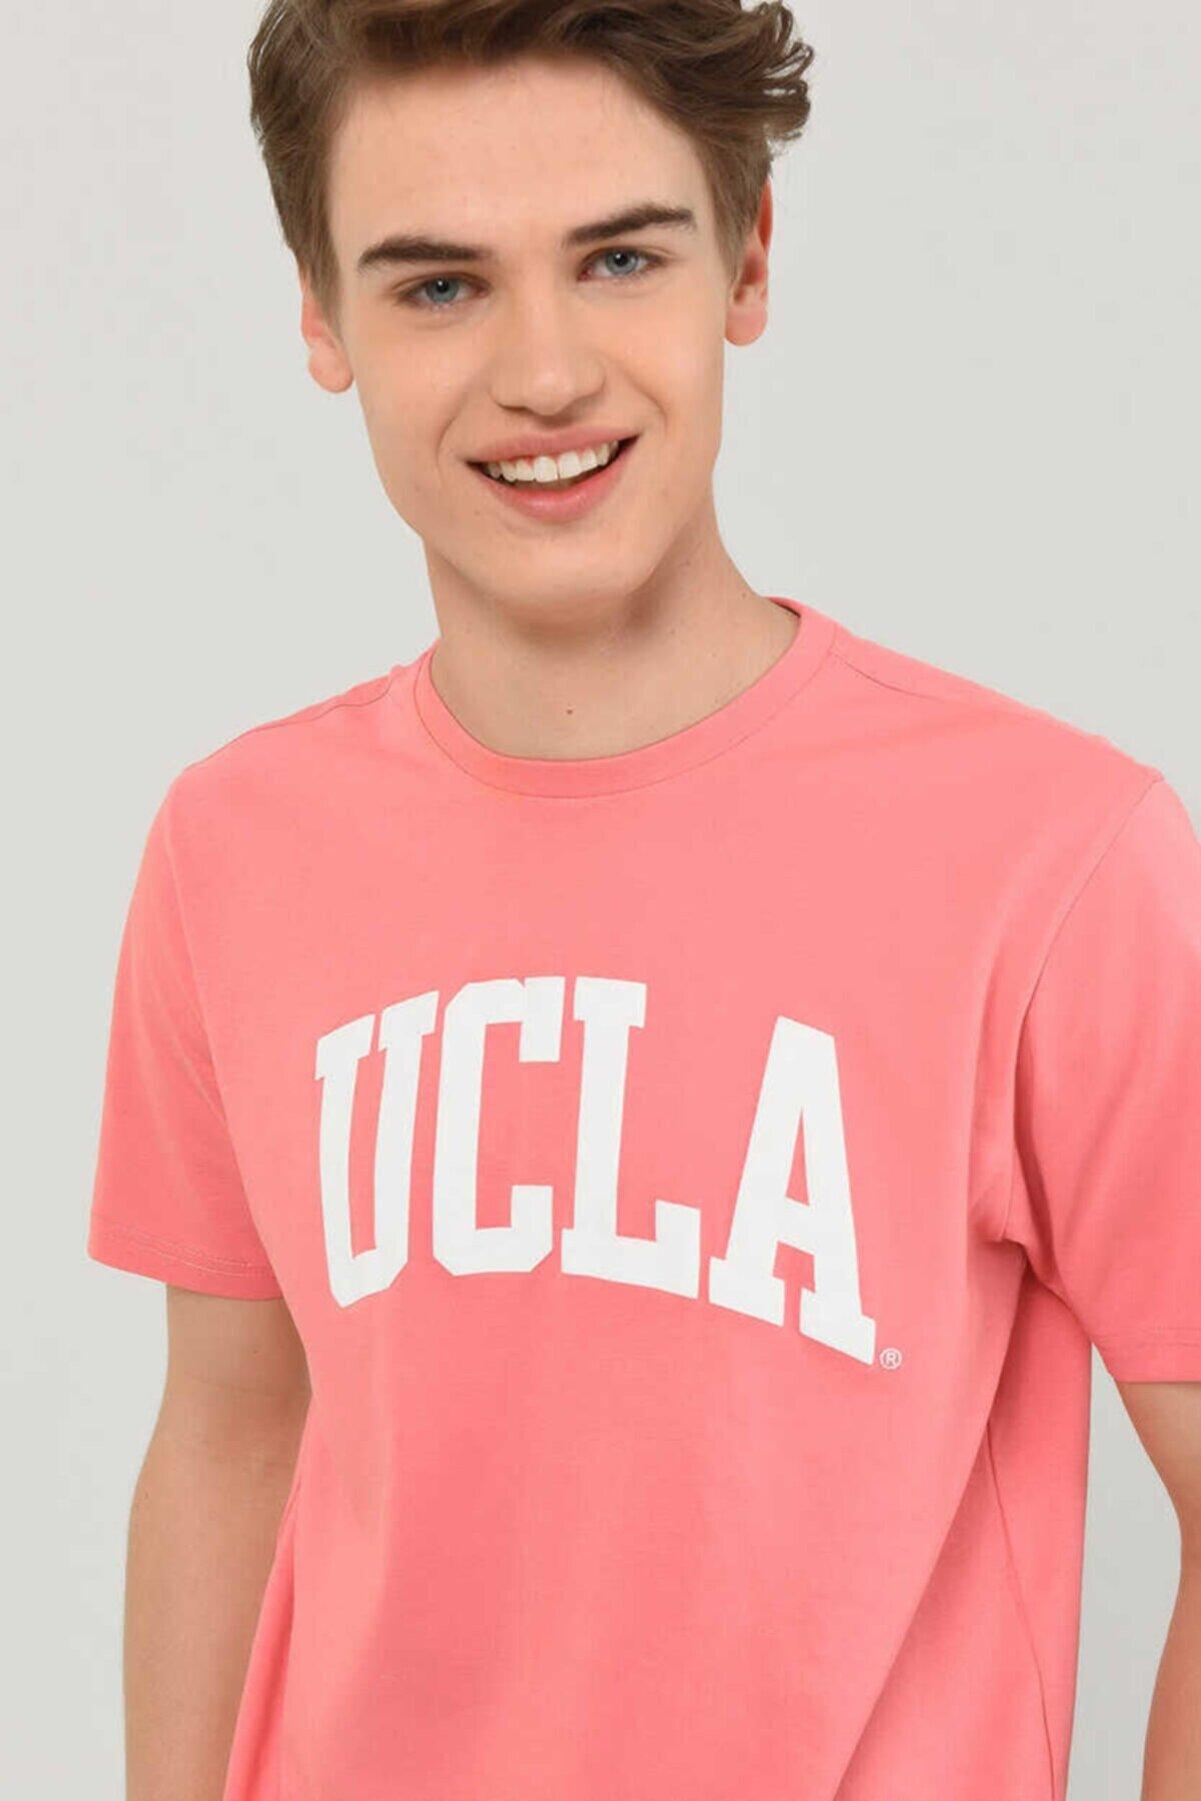 Ucla Culver Pembe Bisiklet Yaka Baskılı Erkek Tshirt